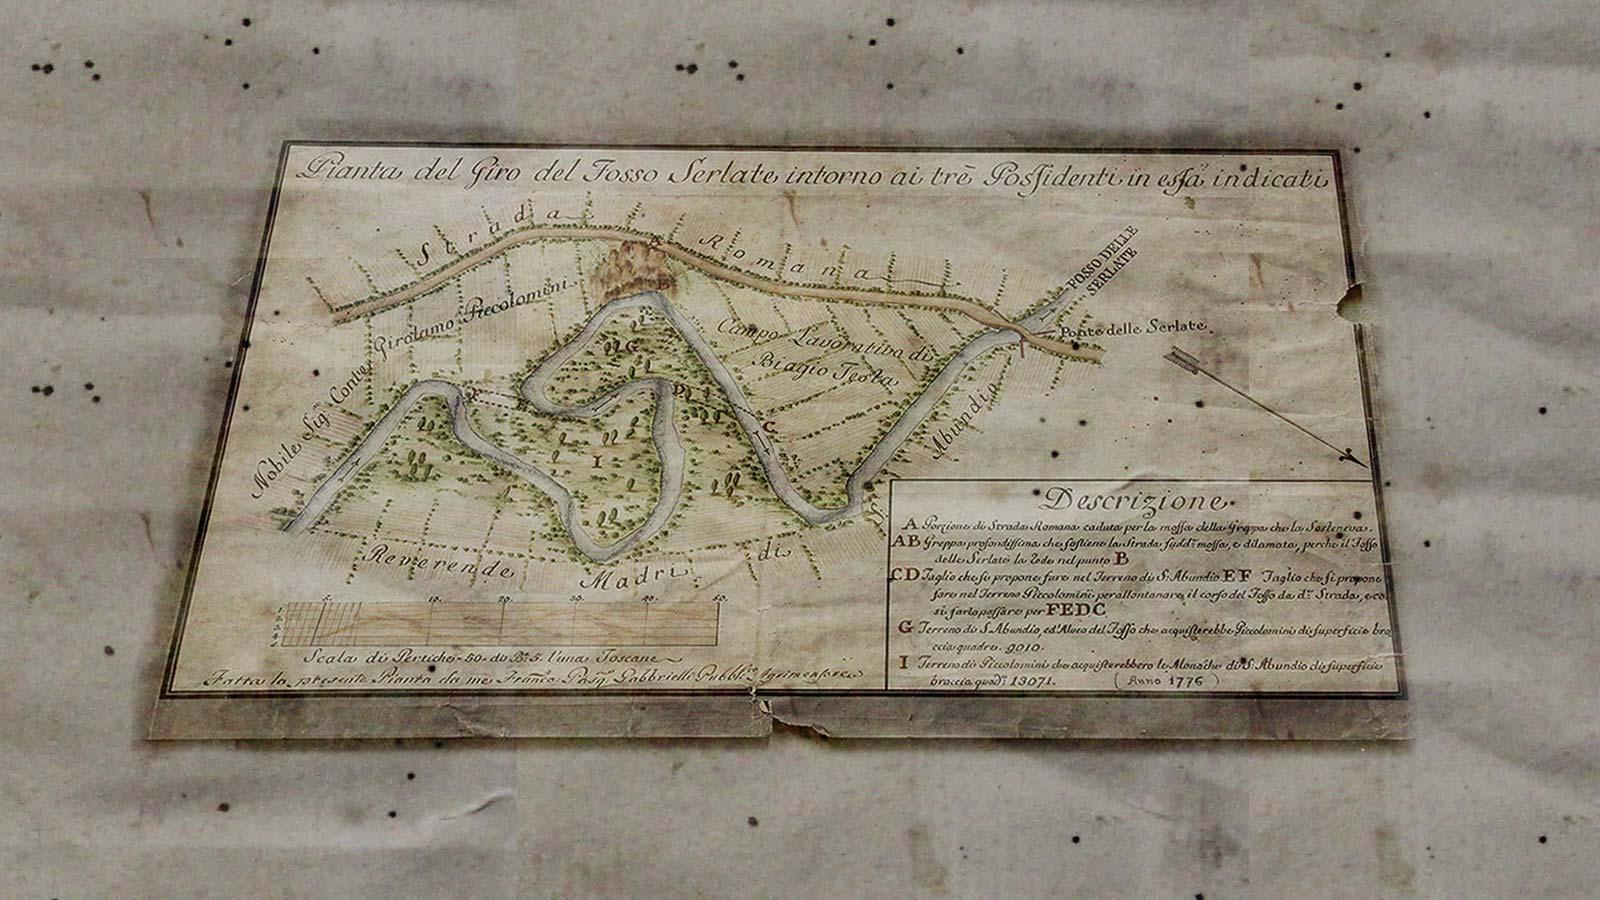 Catasto-Strada-Romana-17761